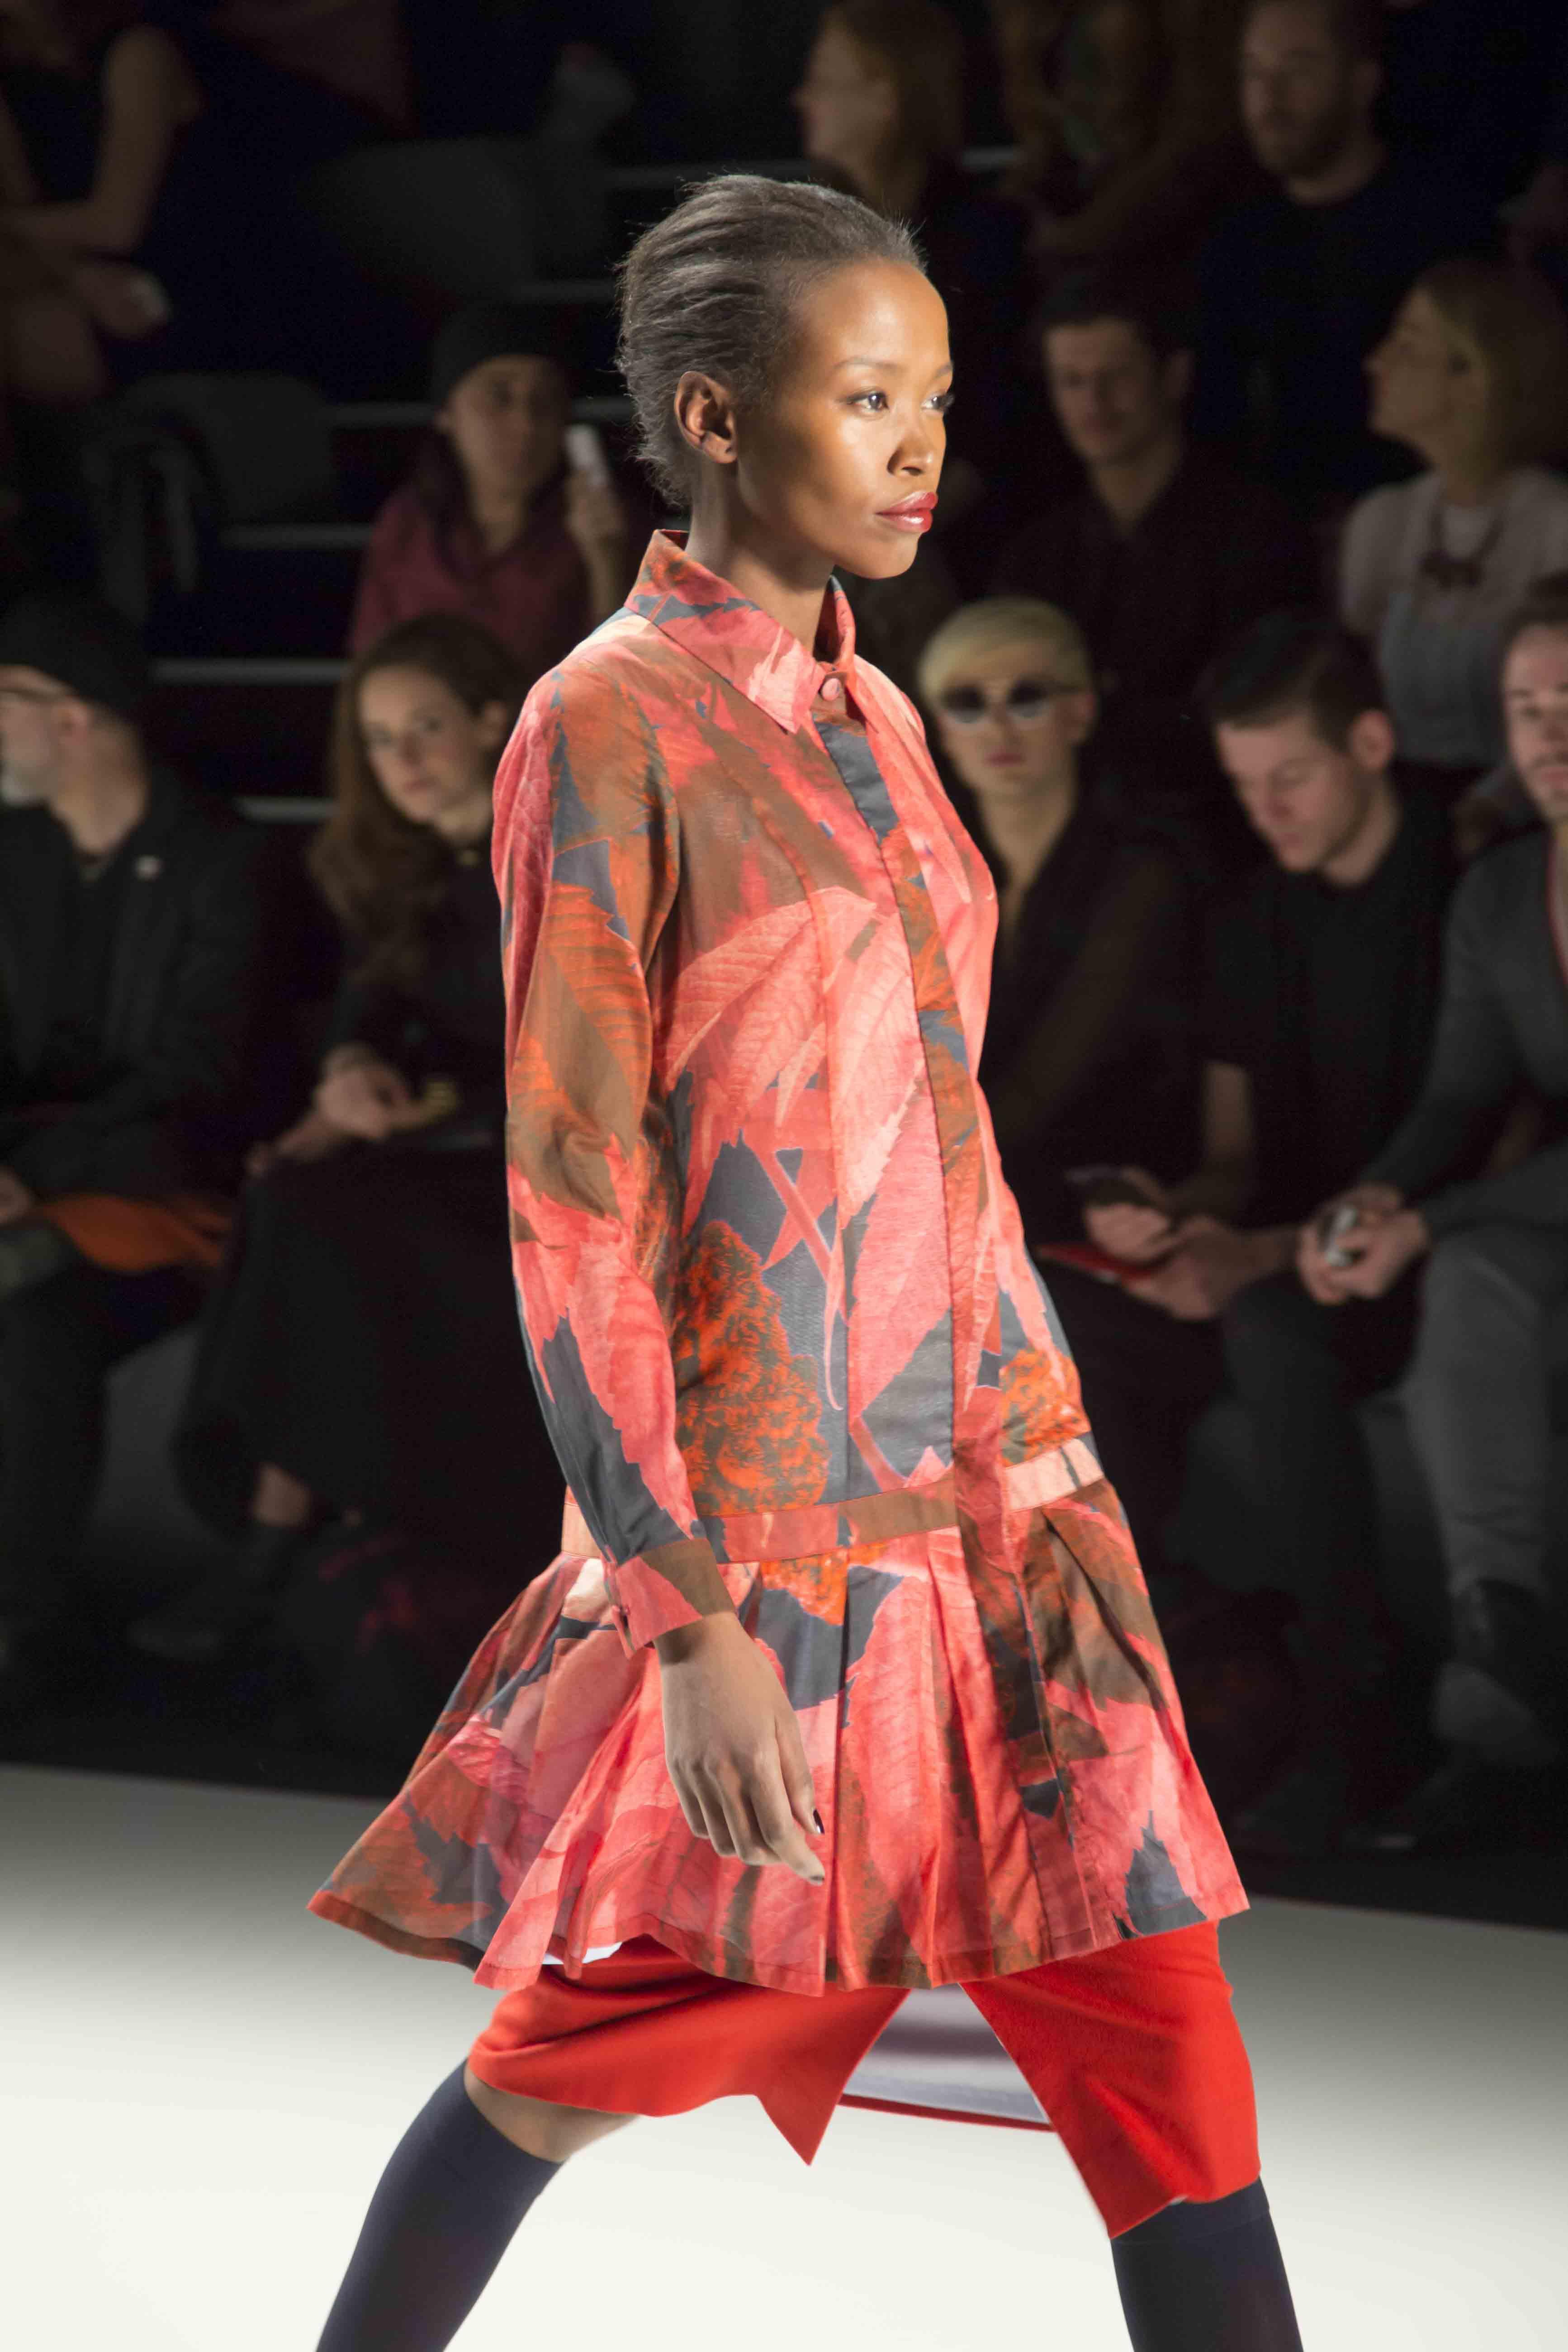 fashion week berlin - maria brussig - zalando lounge - 22012016 - 16